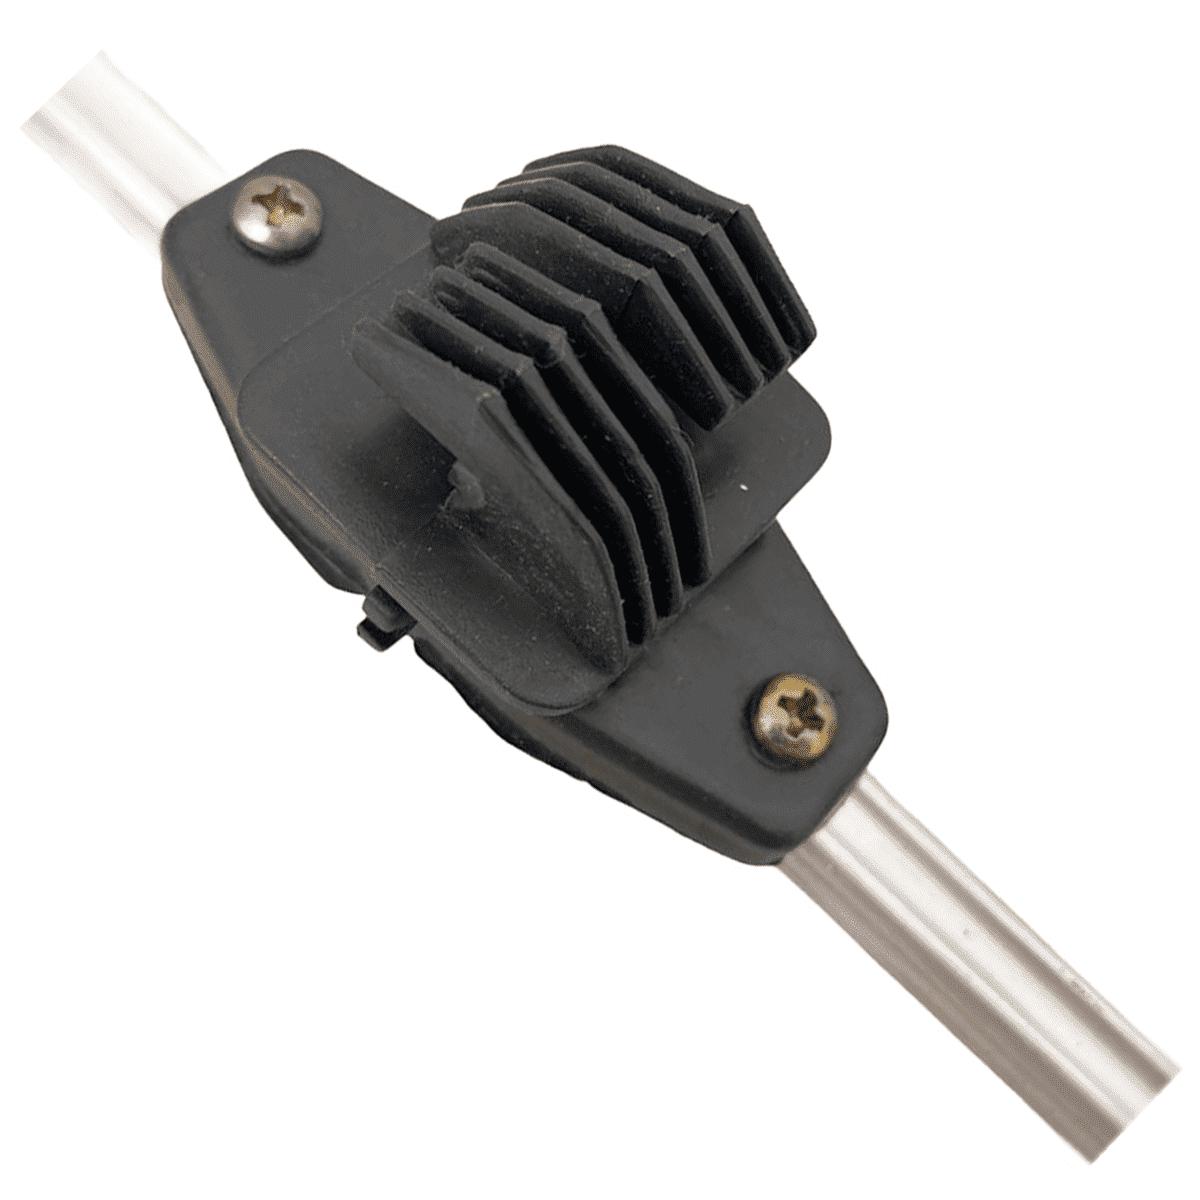 Kit 5 Haste Vareta Cerca Elétrica Residencial Alumínio 40cm  - Ambientude Agro e Pet